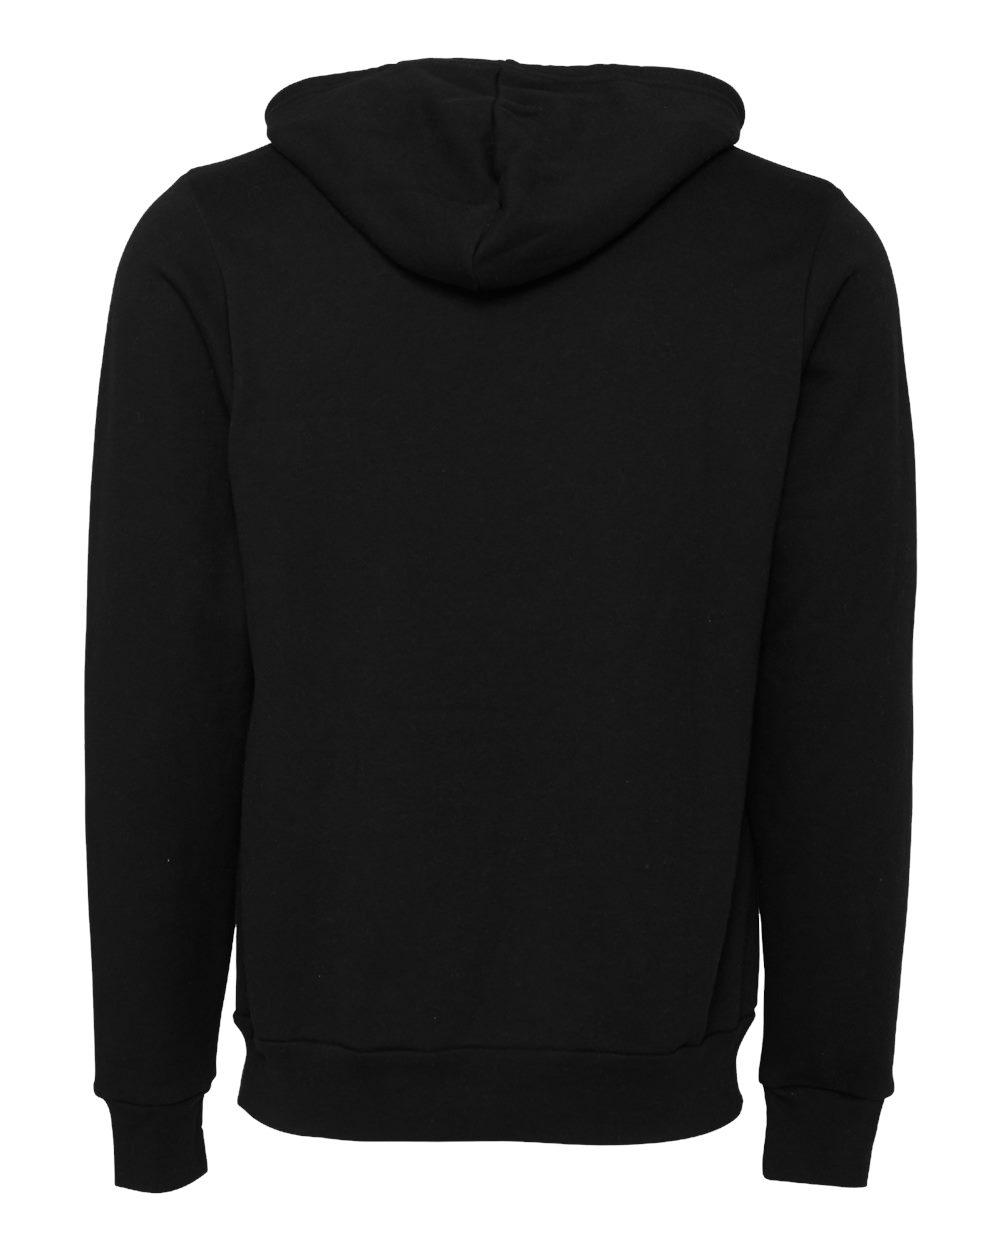 Bella-Canvas-Unisex-Sponge-Hooded-Pullover-Sweatshirt-Blank-3719-up-to-2XL thumbnail 29